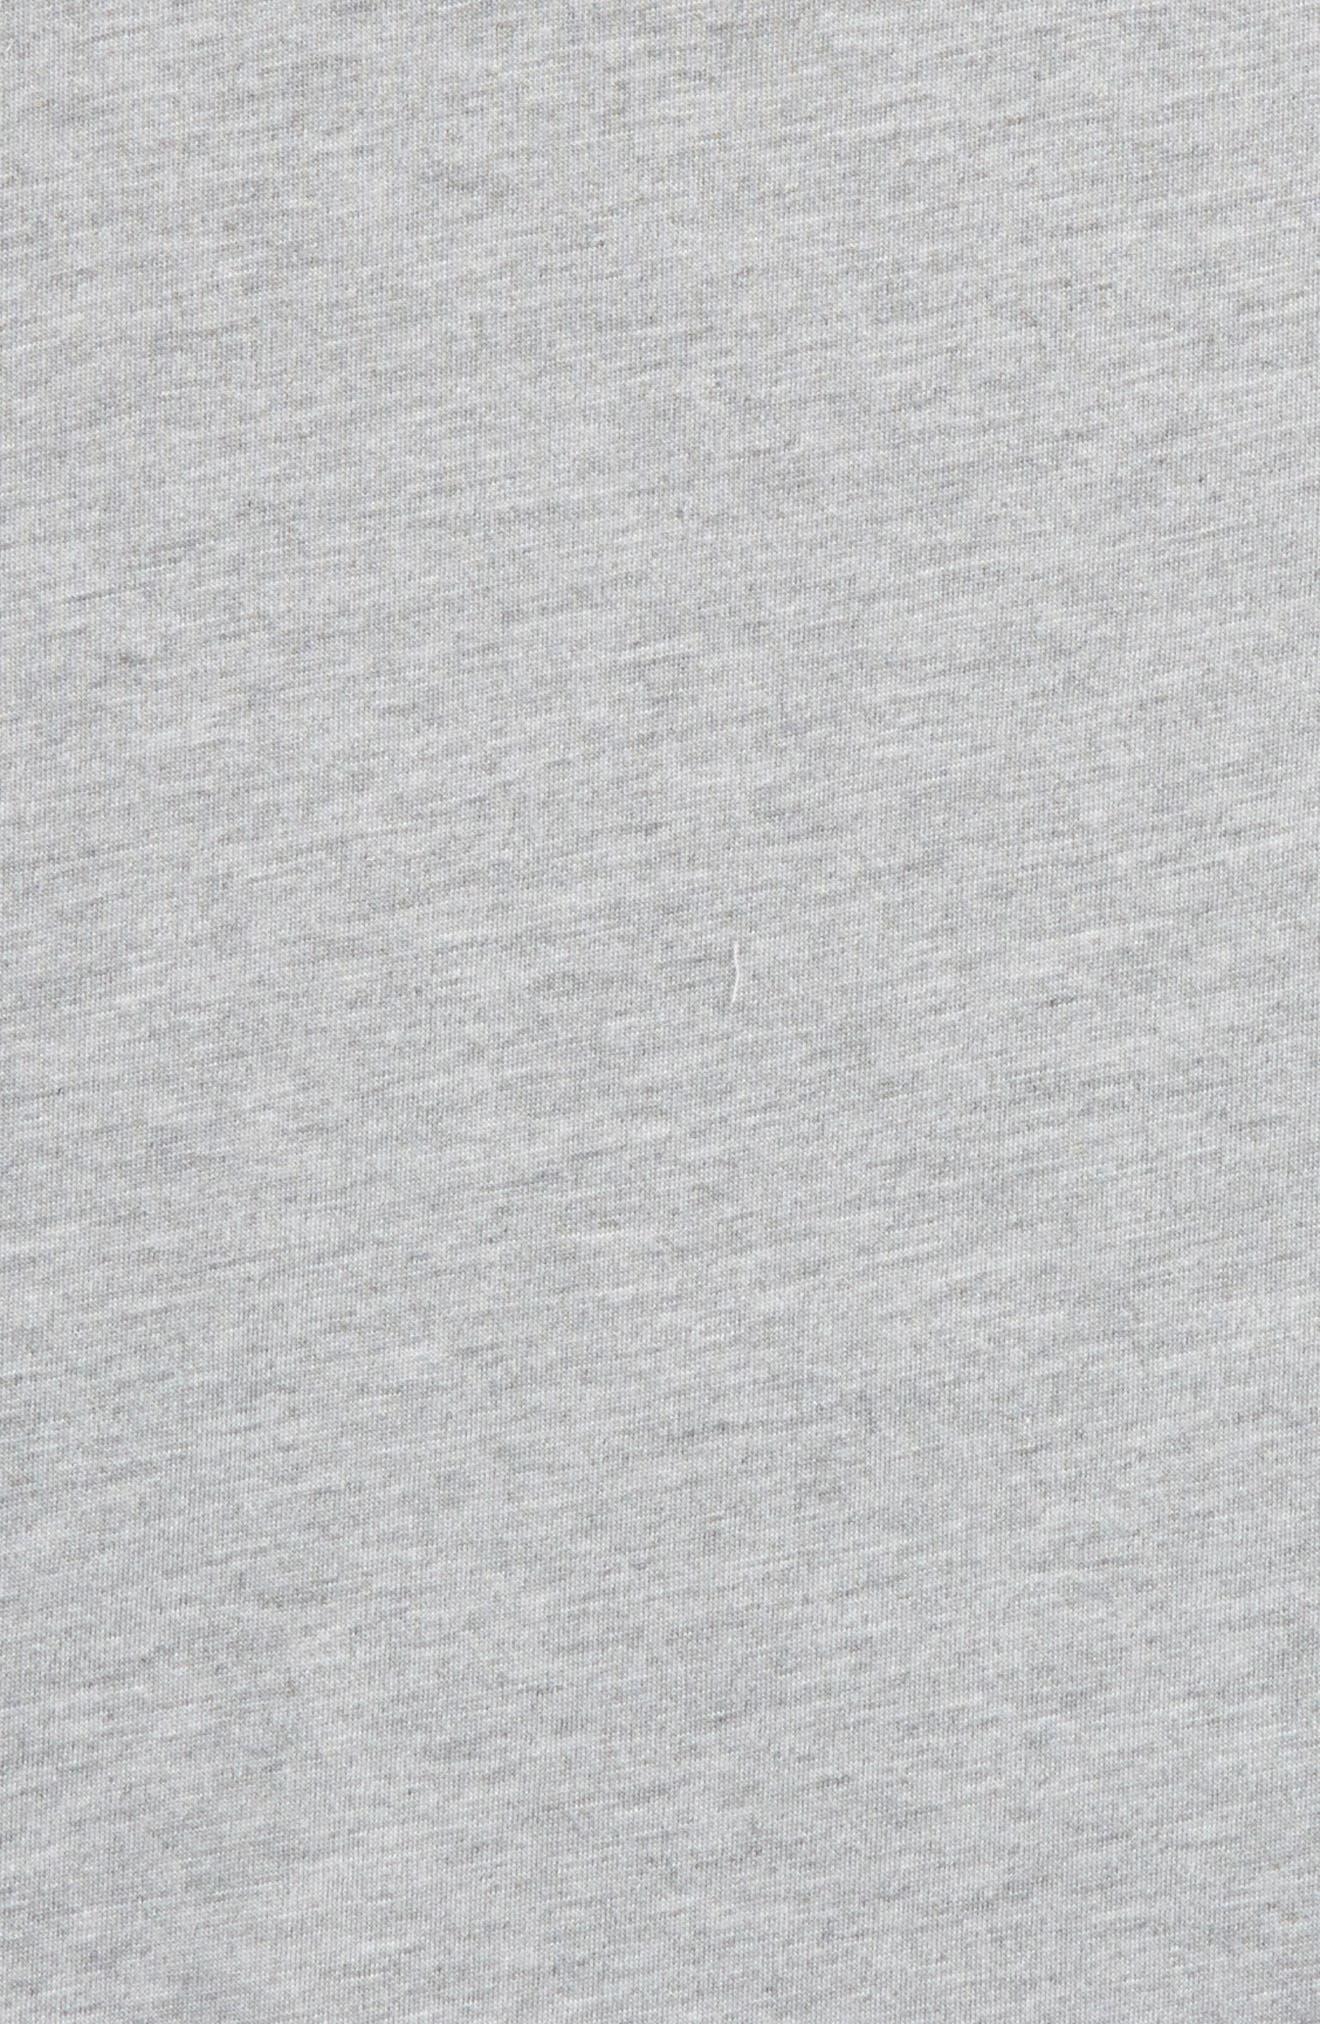 Sleep T-Shirt,                             Alternate thumbnail 2, color,                             030